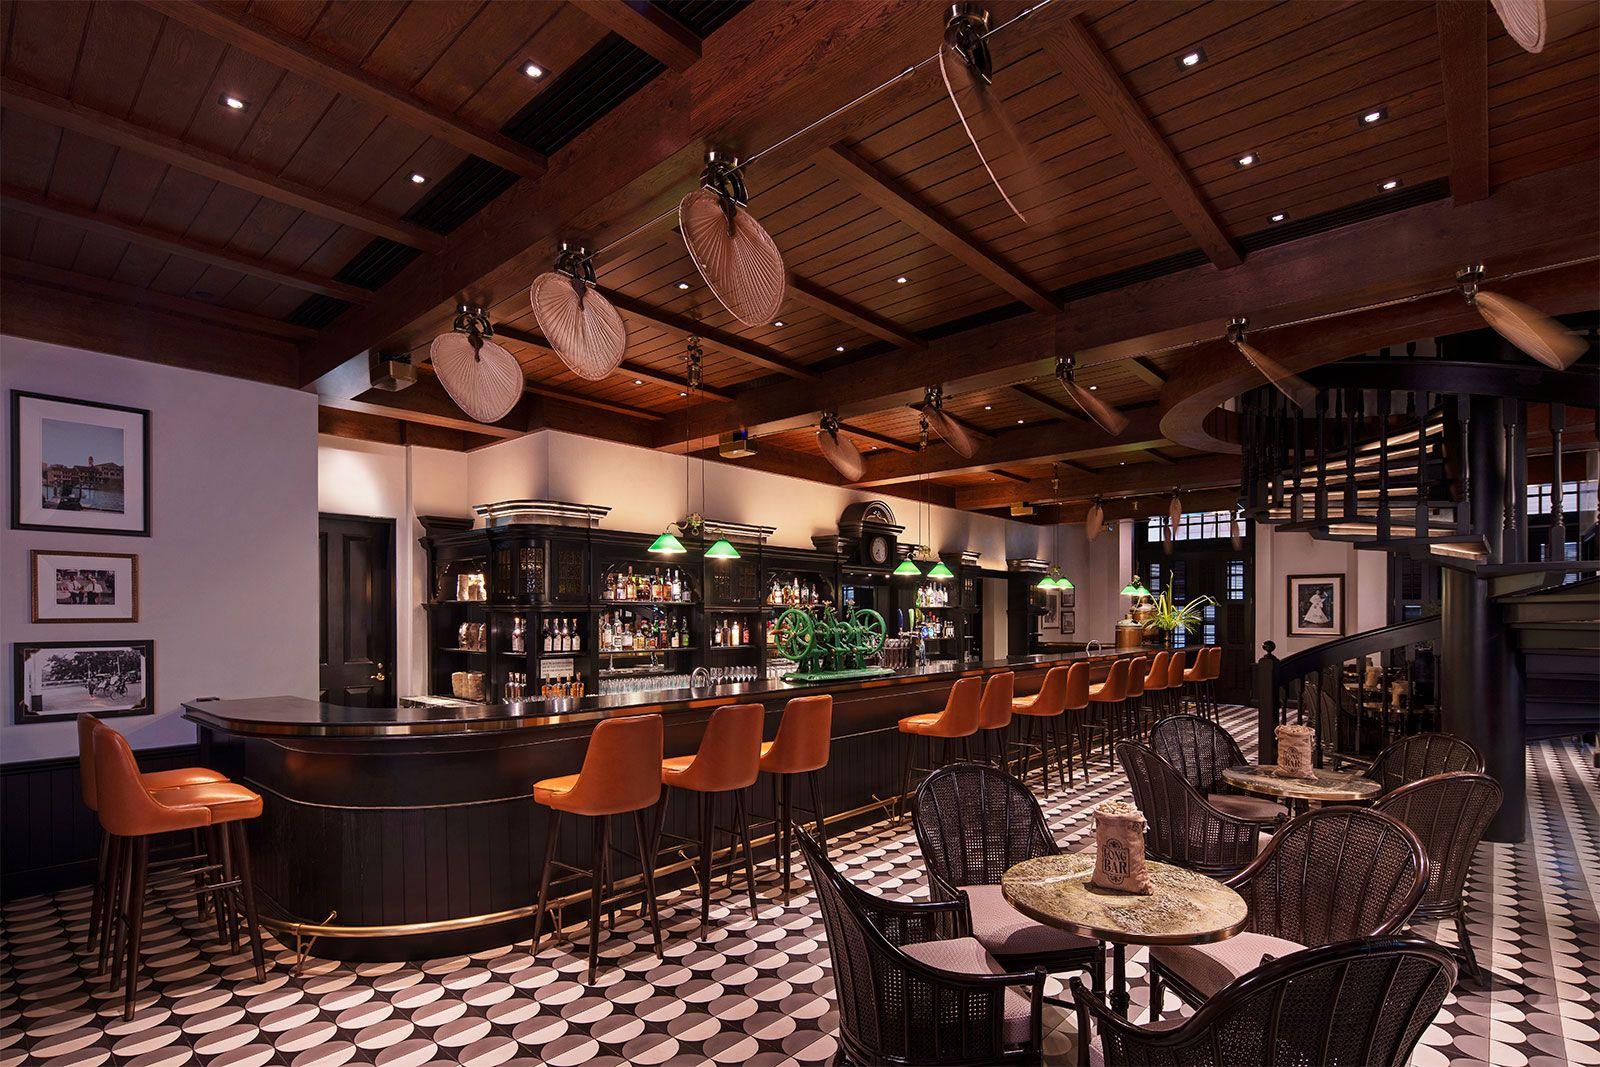 Where To Eat This Week: The Lobby Lounge, Niku Kin, Long Bar, Smoke & Mirrors, Skirt And White Rose Café